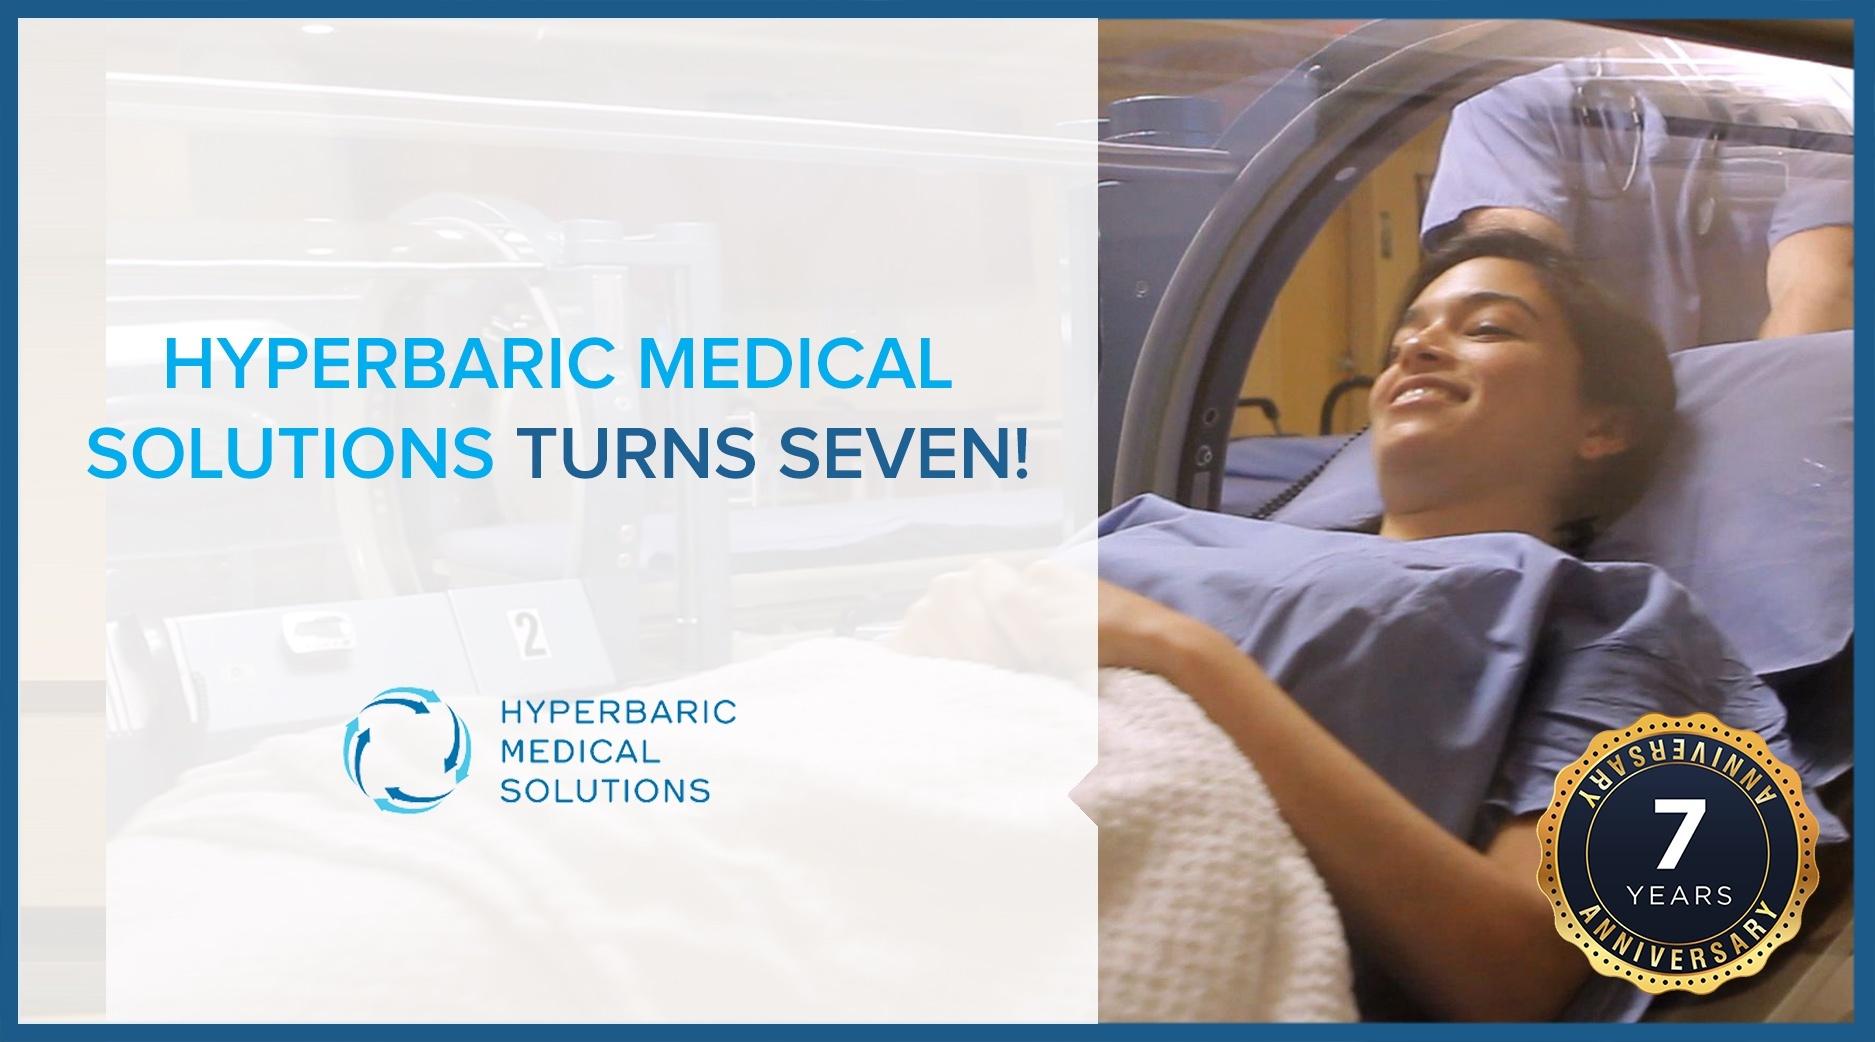 HYPERBARIC MEDICAL SOLUTIONS TURNS SEVEN!